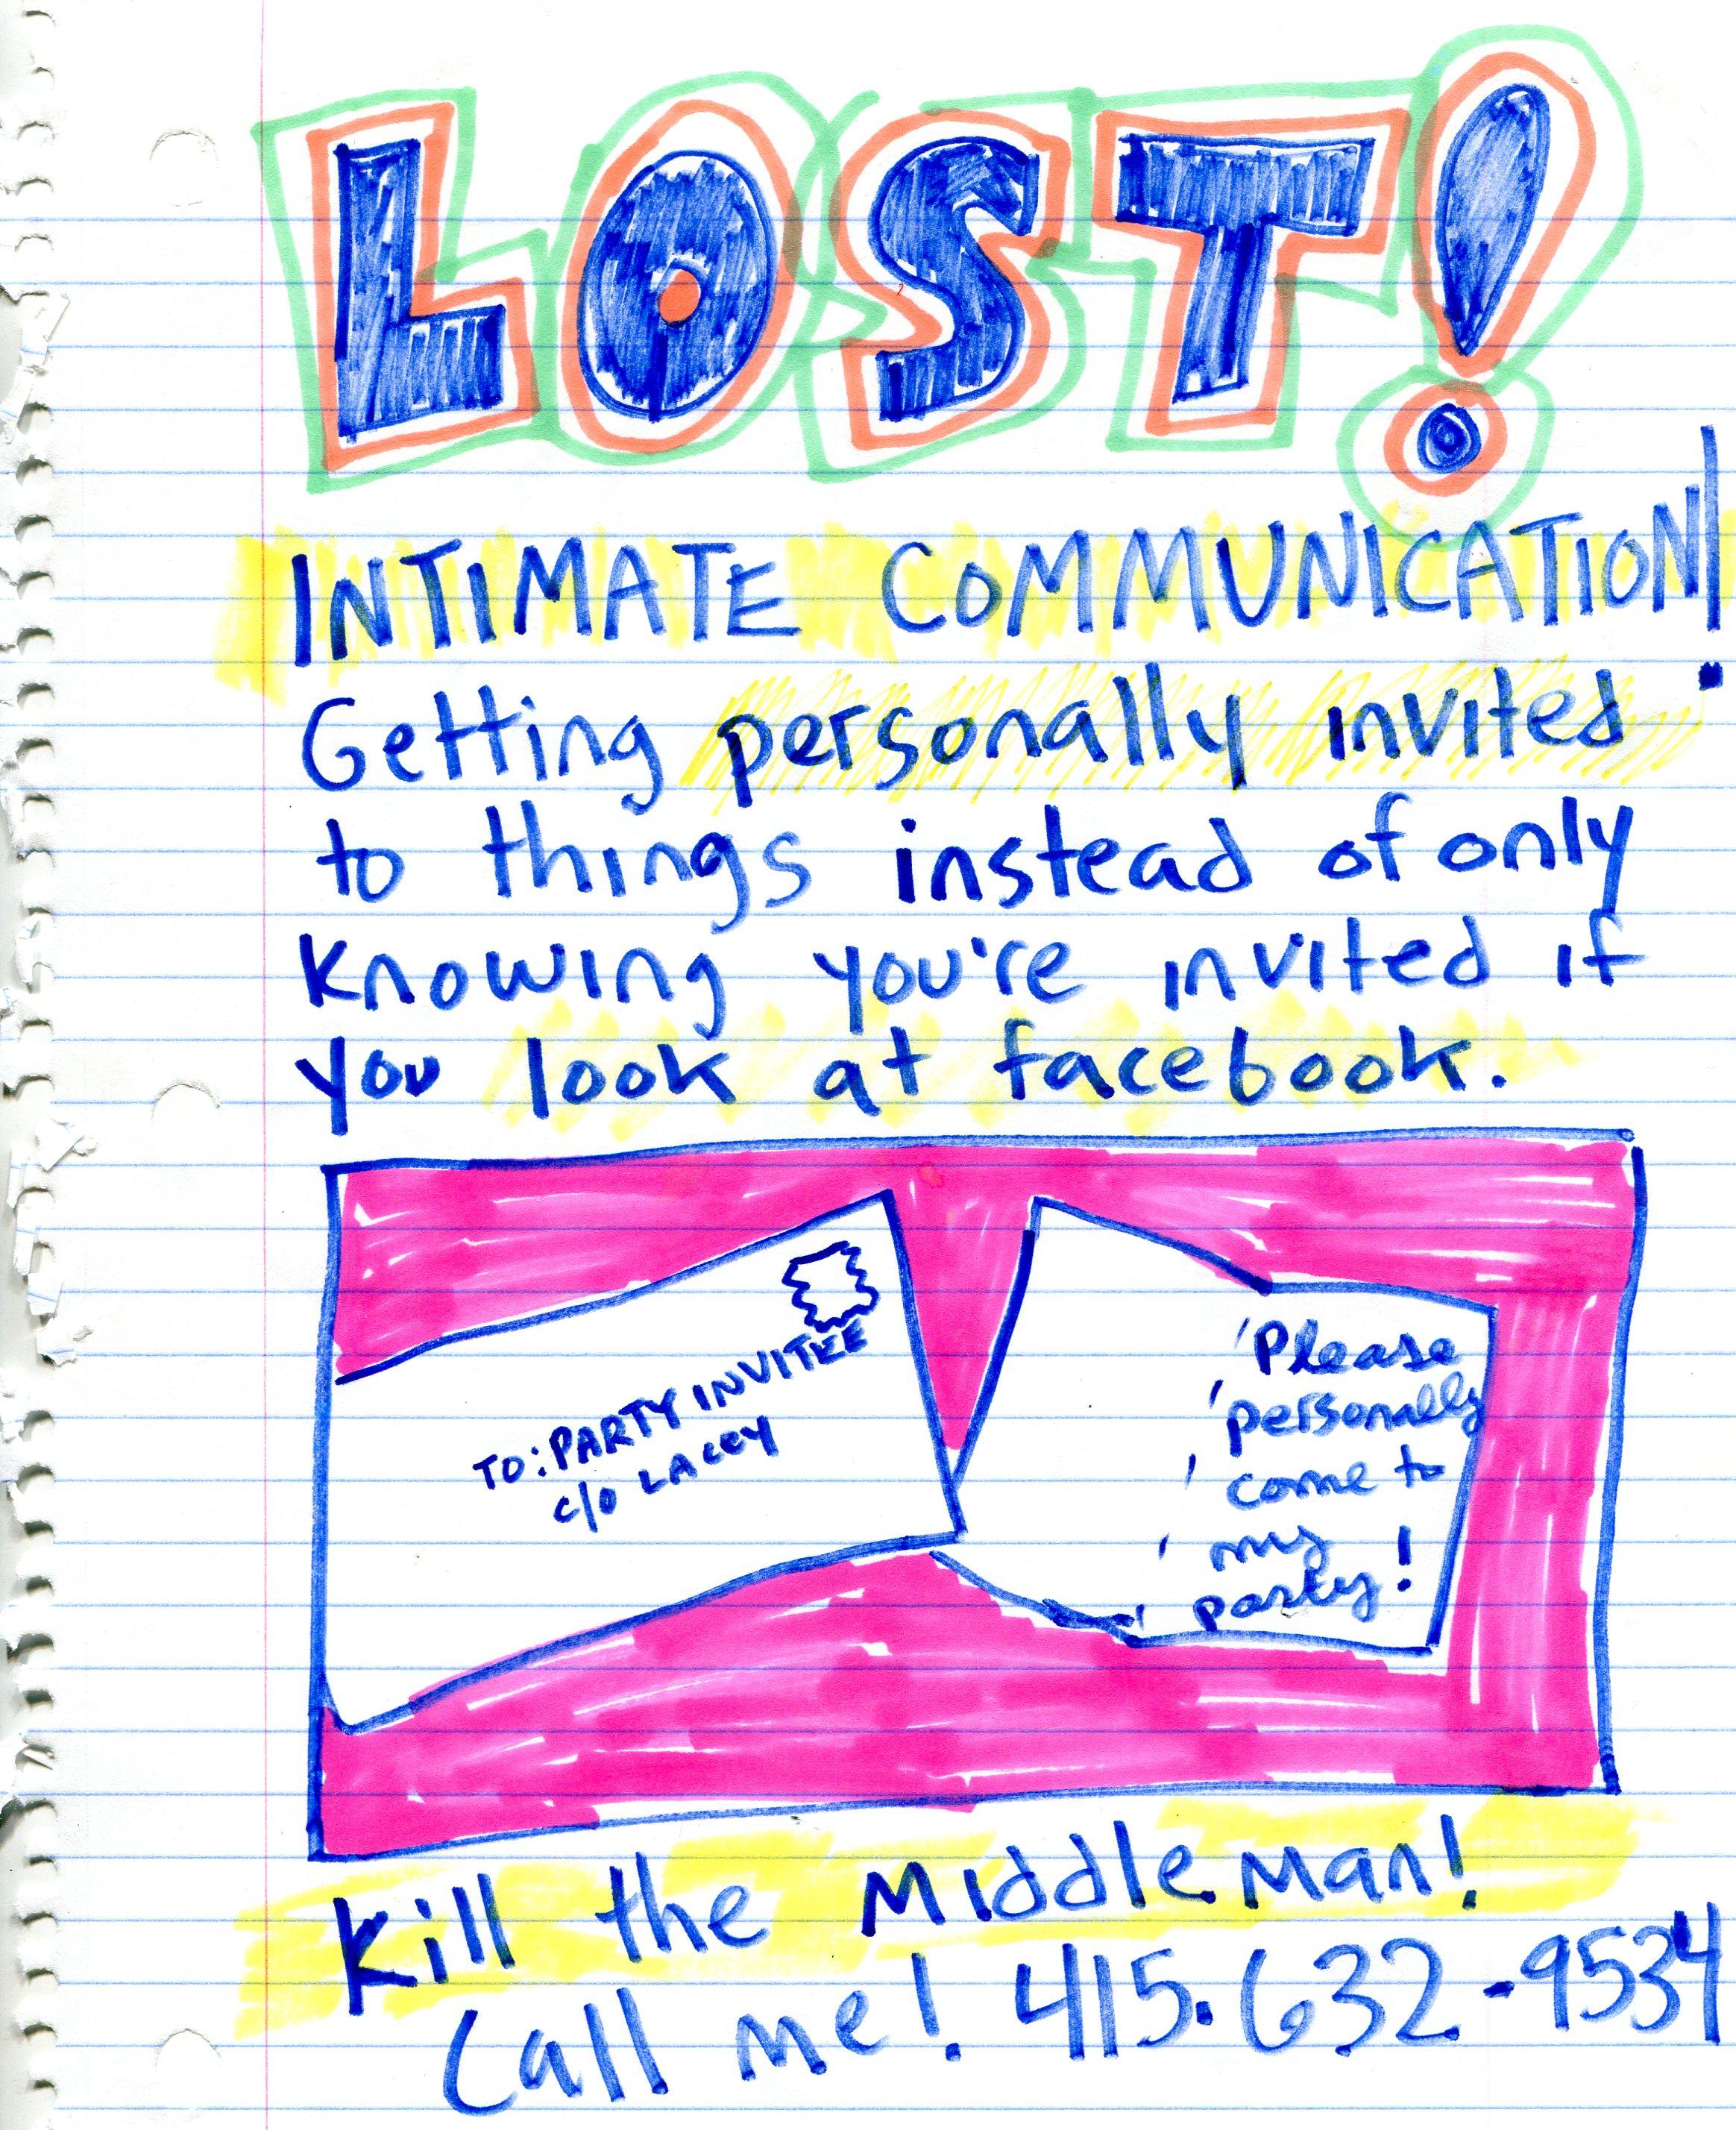 intimatecommunication.jpg